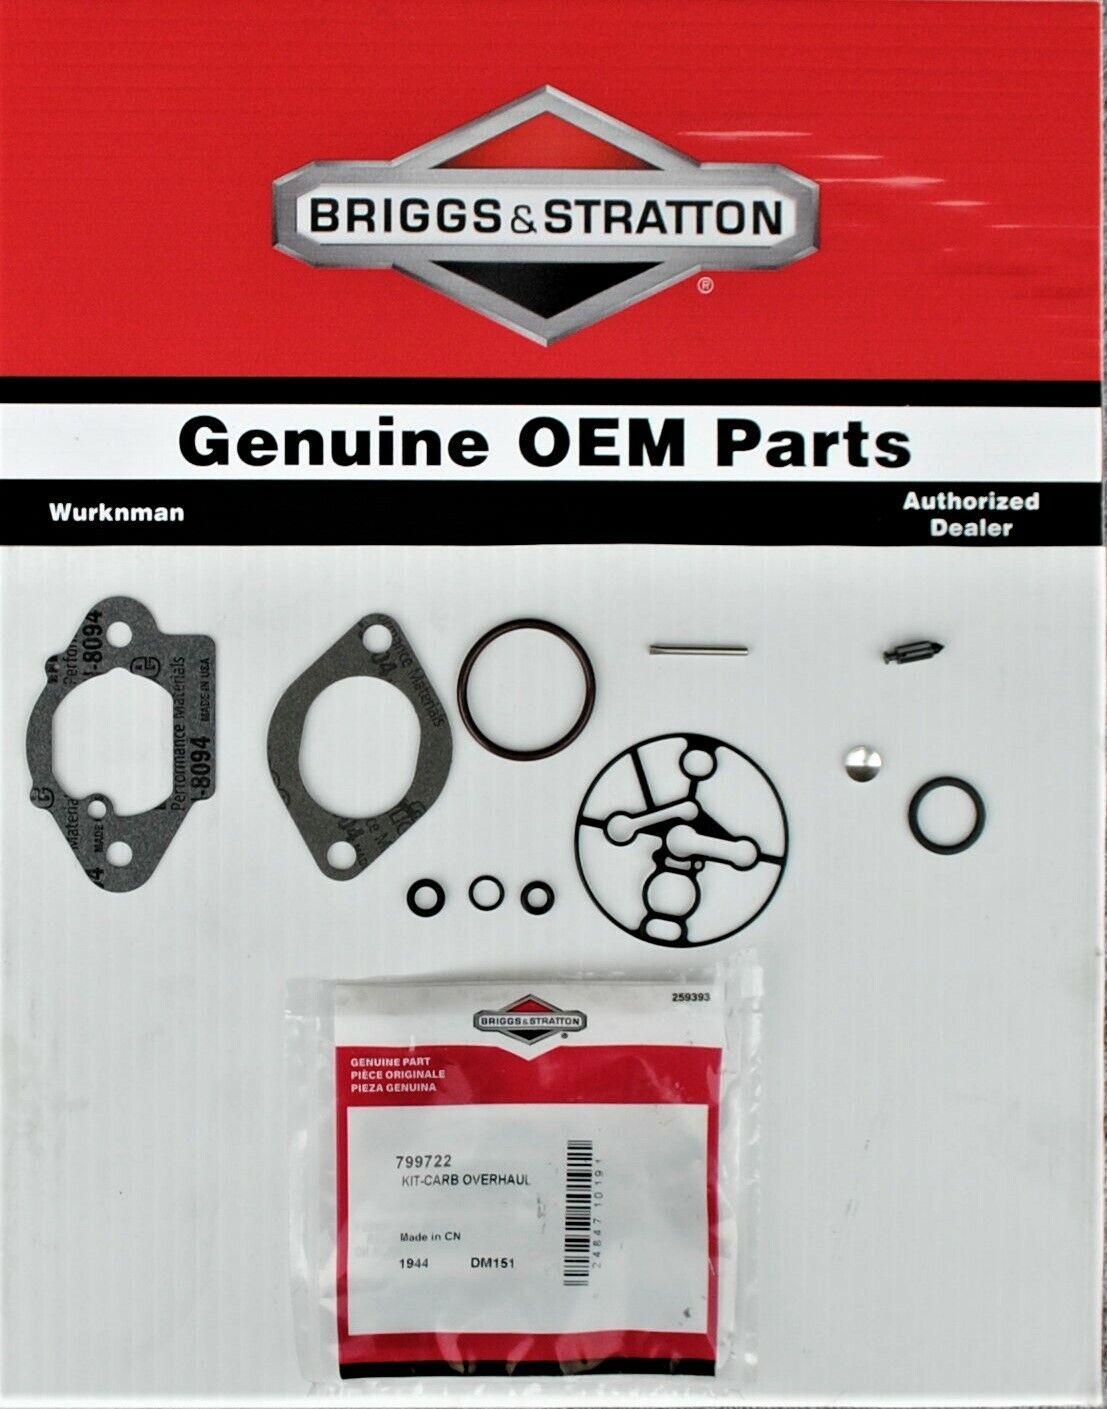 OEM Briggs /& Stratton 843787 Carburetor Overhaul Kit 842884 842436 842882 842850